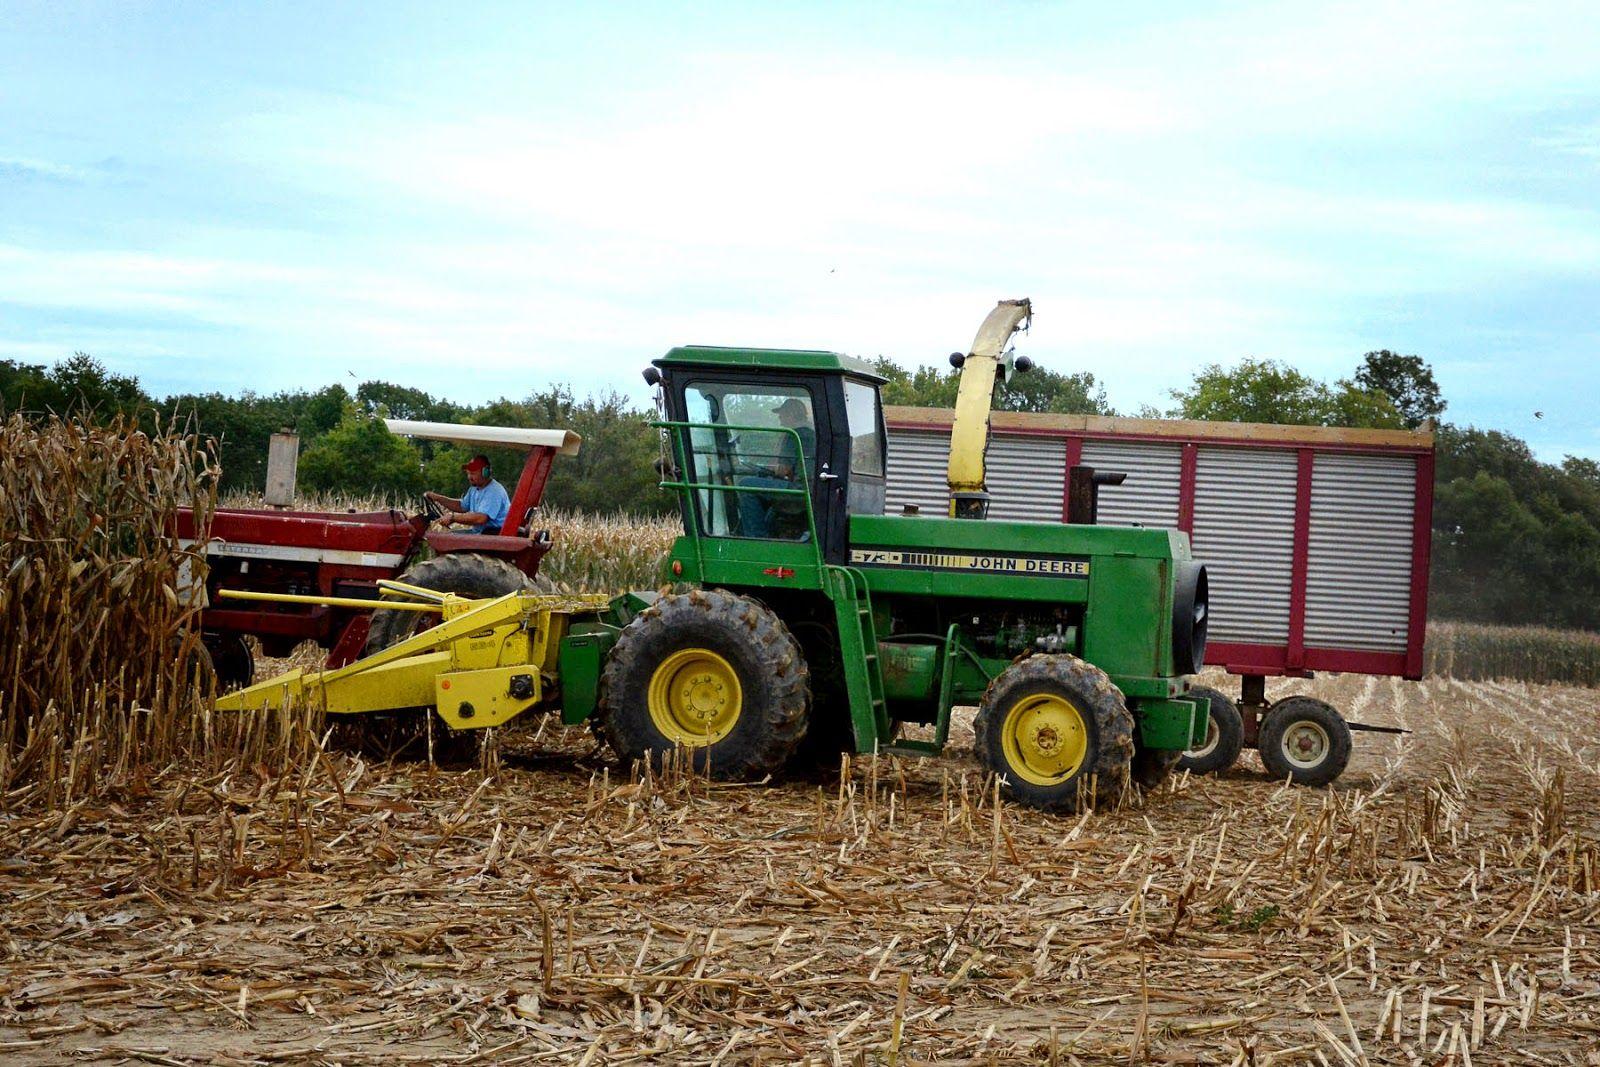 John Deere 5830 This Farm Family's Life: It's Choppin' Time.